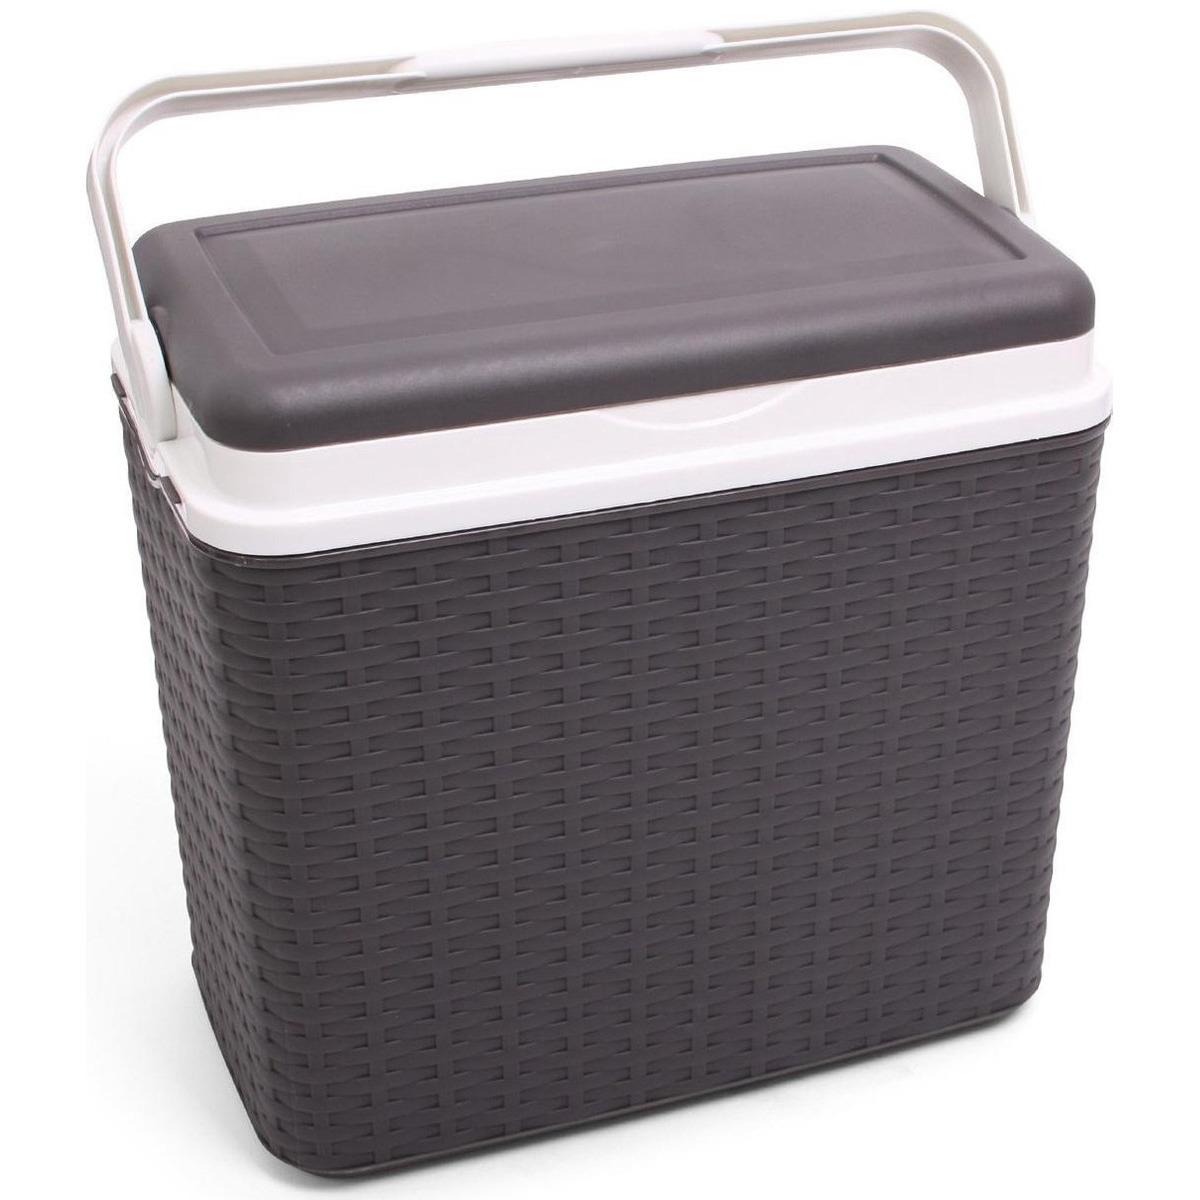 Koelbox antraciet grijs rotan 10 liter 30 x 19 x 28 cm